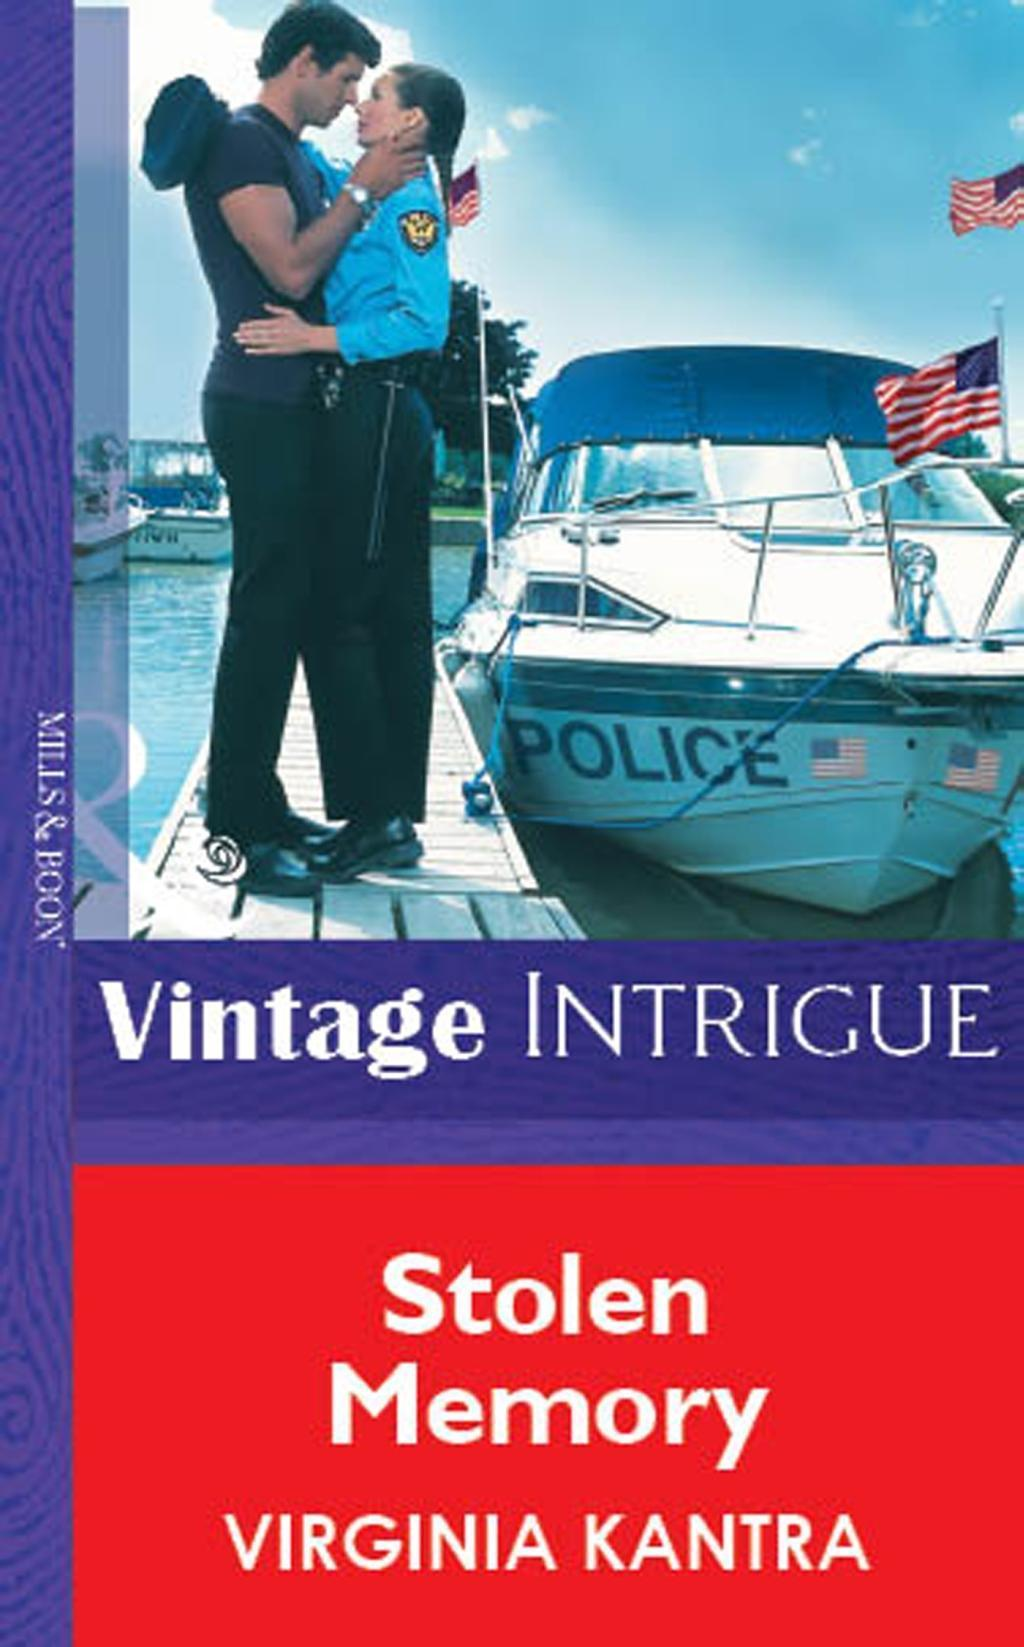 Stolen Memory (Mills & Boon Vintage Intrigue)